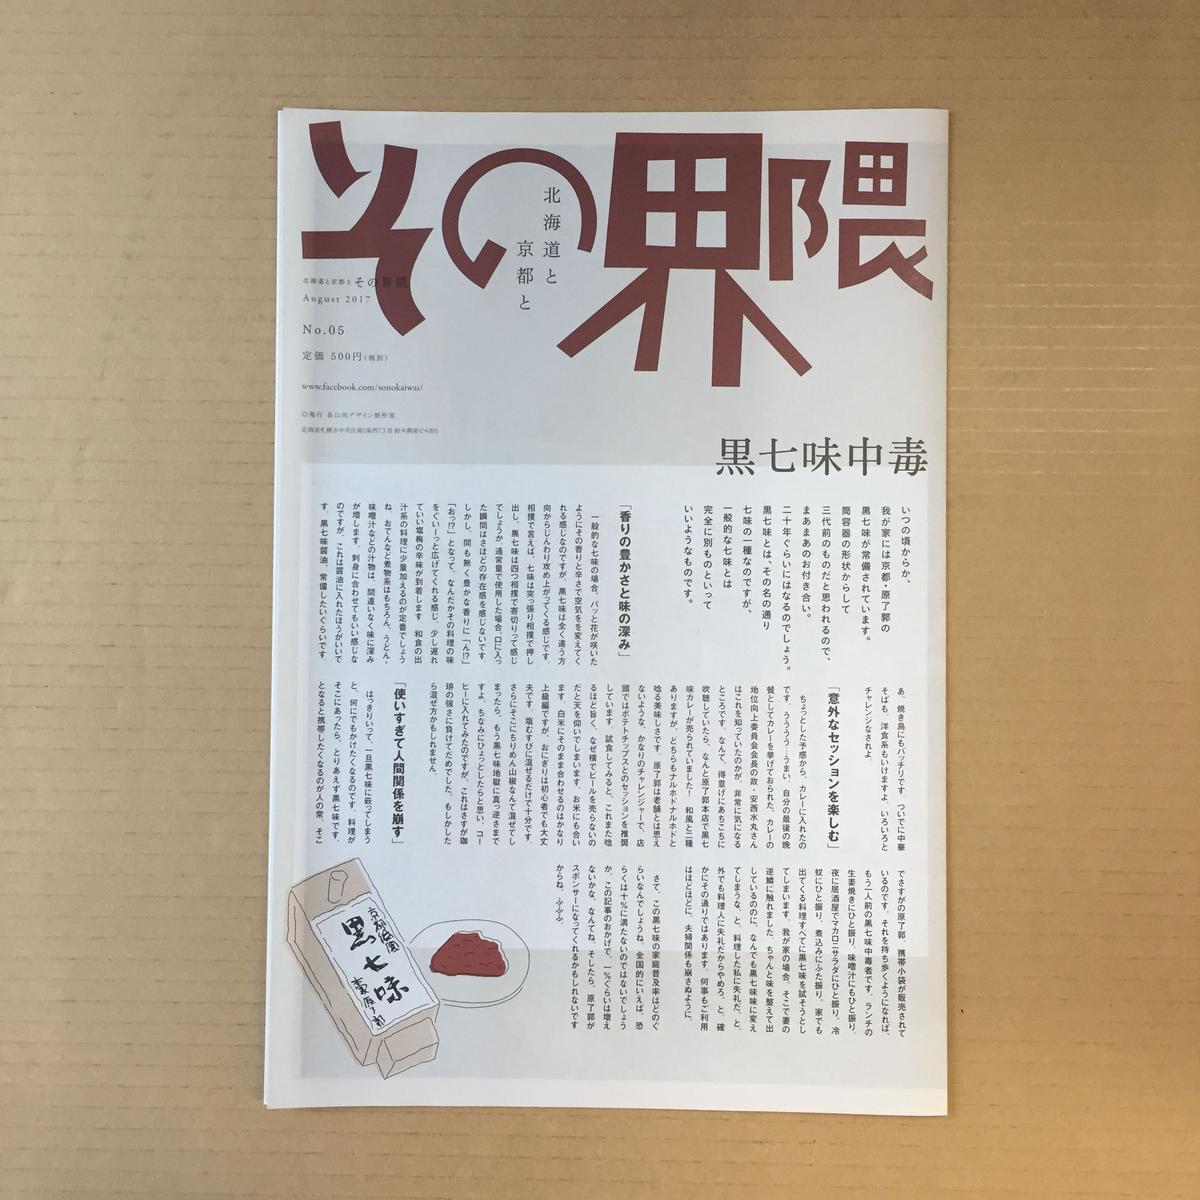 ng-non-bindable>北海道と京都と その界隈  第5号 | HH DESIGN